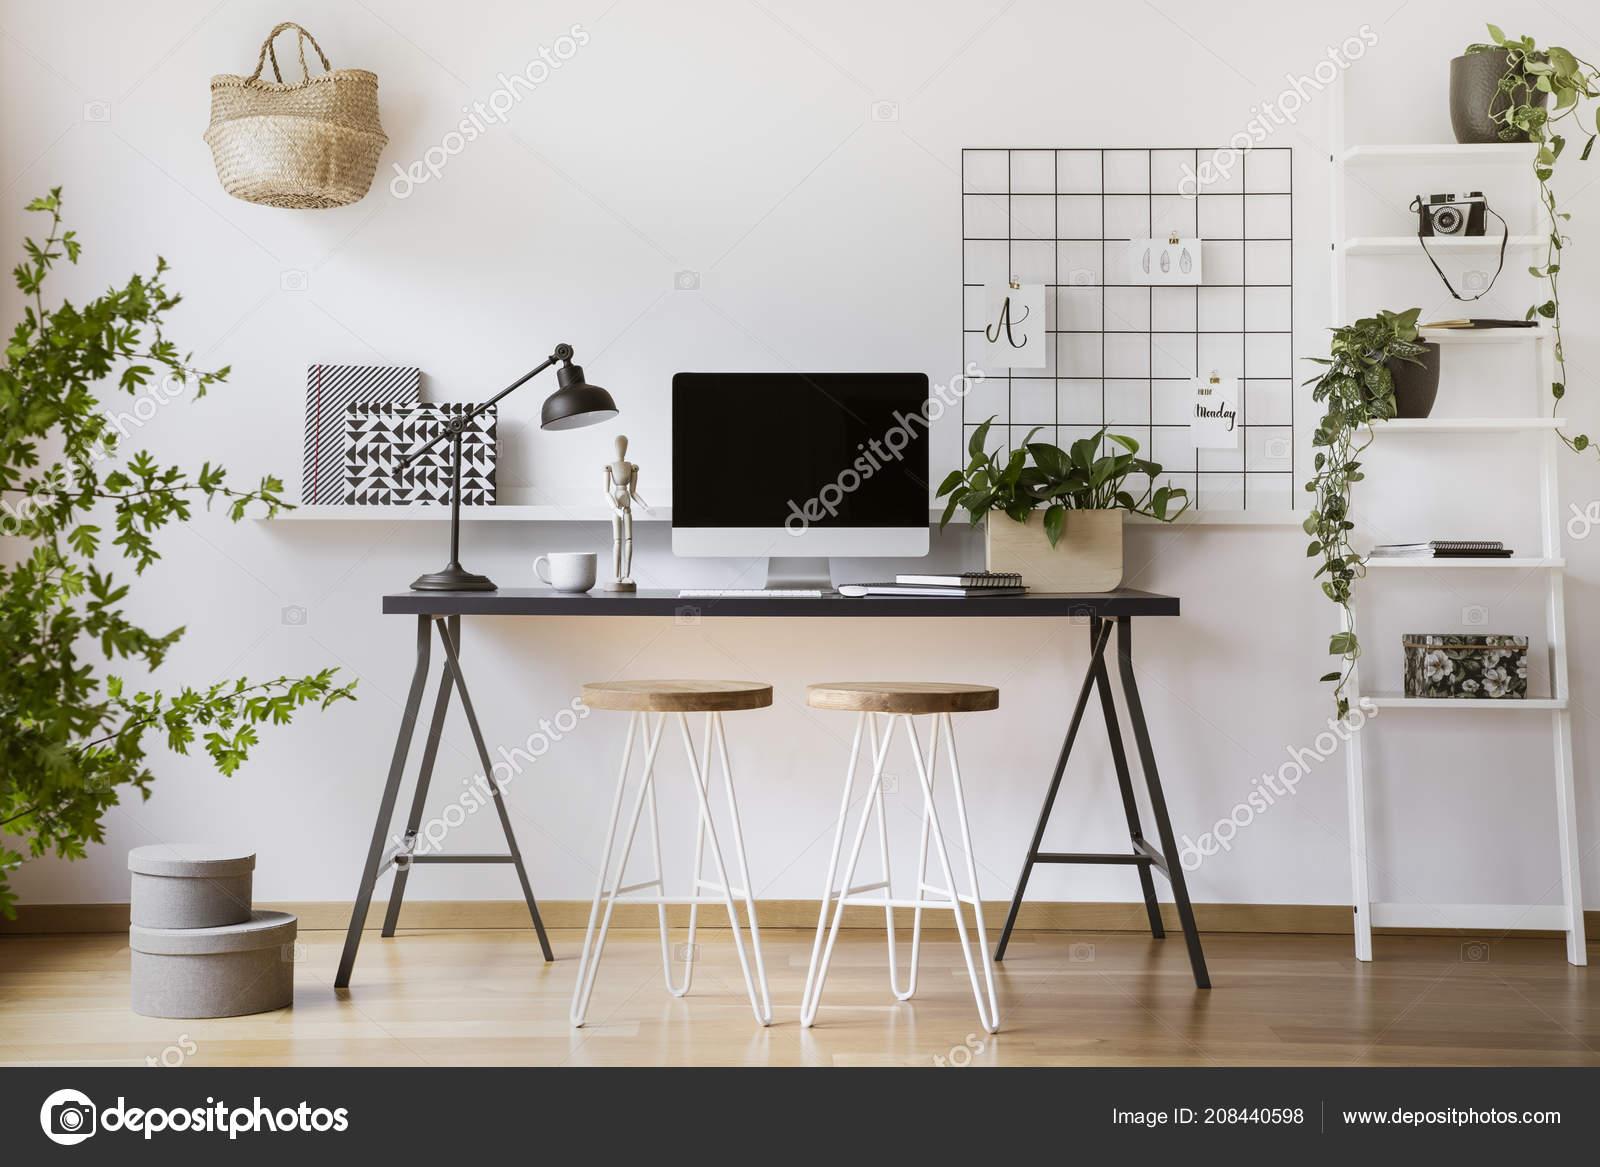 Desktop computer mock-up on an industrial desk in a scandinavian student  bedroom interior workspace with white walls 50